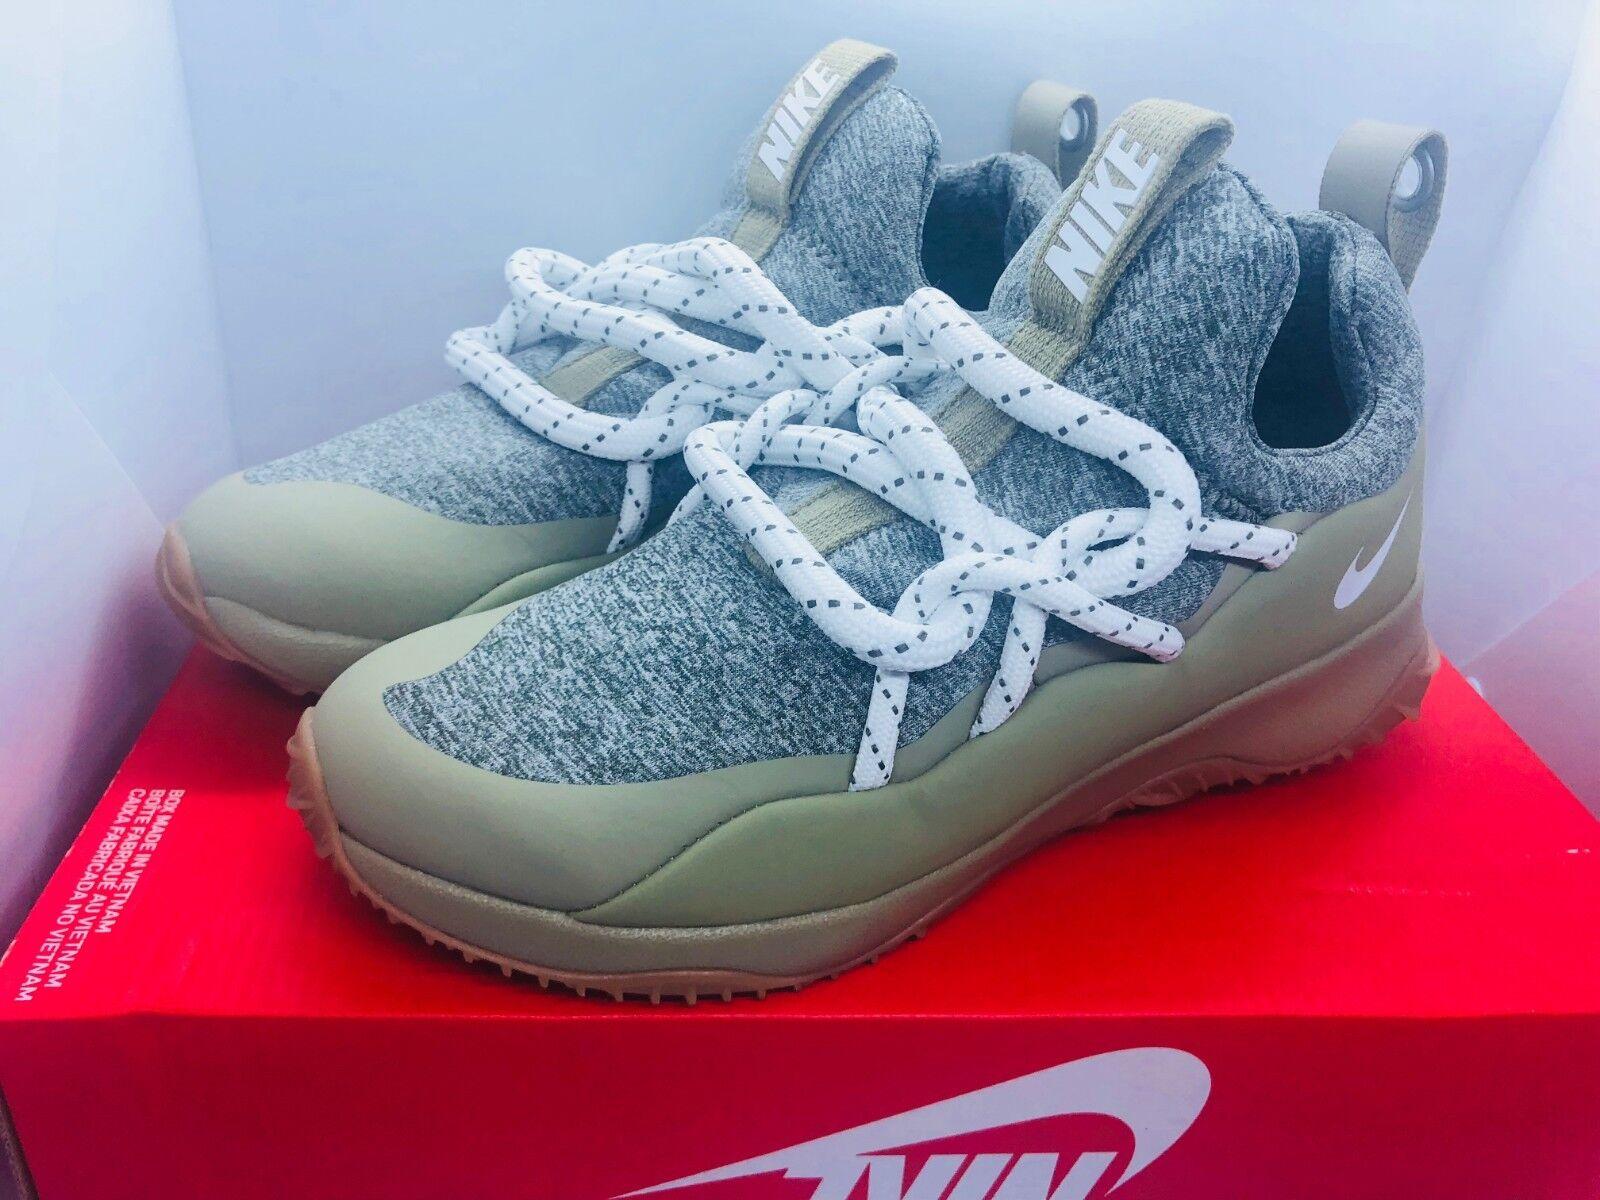 04eedcda8e62 Women s Nike City Loop Loop Loop Casual Shoes Medium Olive Summit White  AA1097-200 Sz 7 8 2cfd05